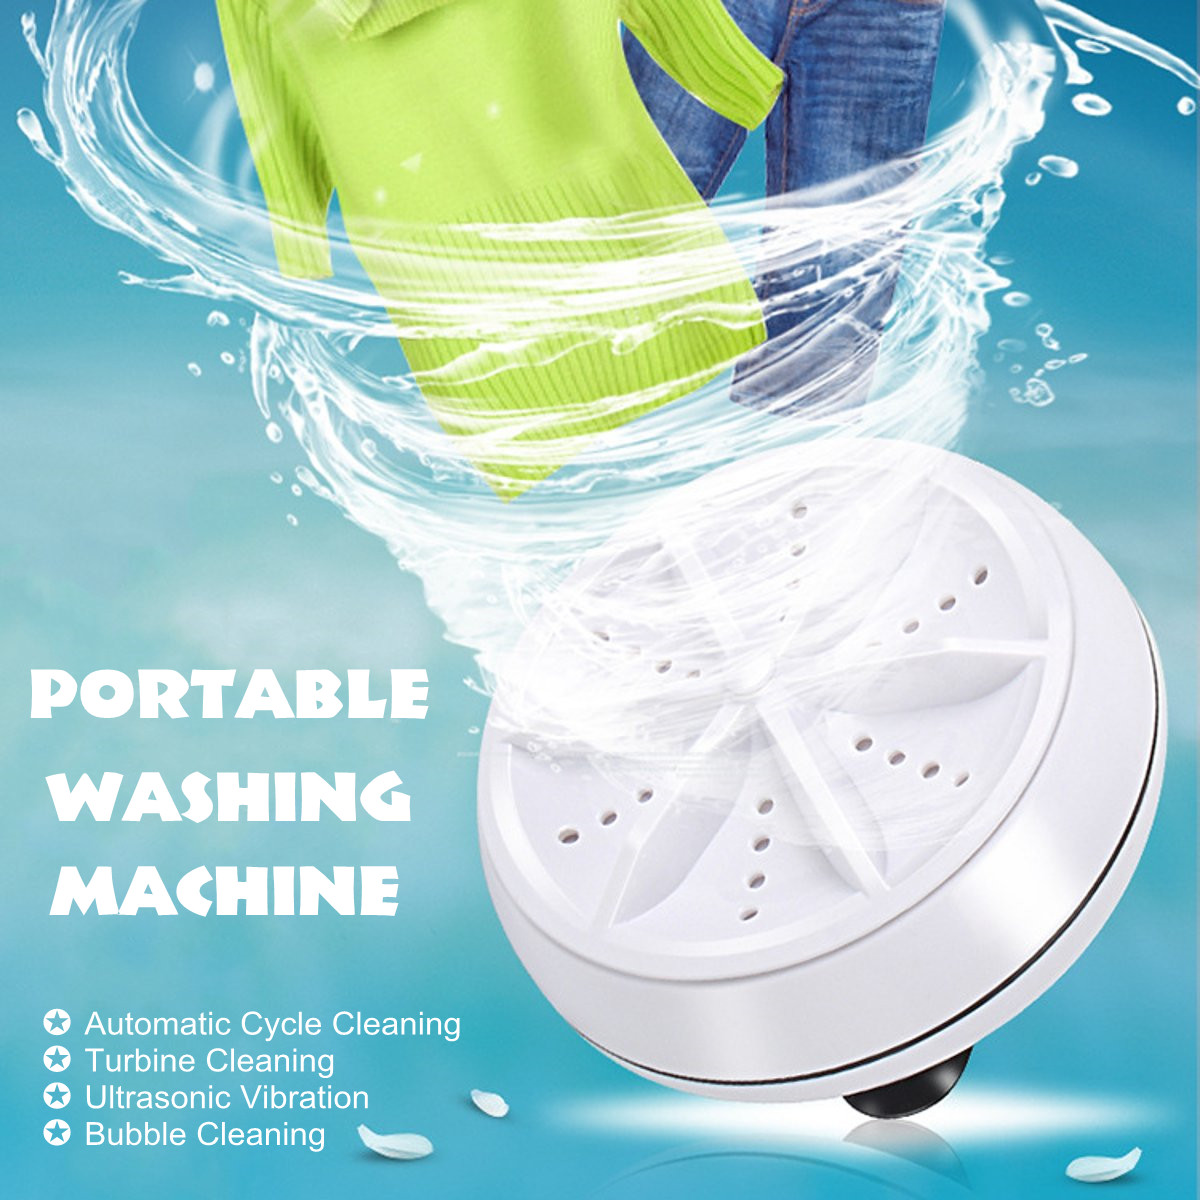 Mini Ultrasonic Washing Machine Portable Turbo Personal Rotating Washer Convenient Travel Home Business Trip USB 6W 10V